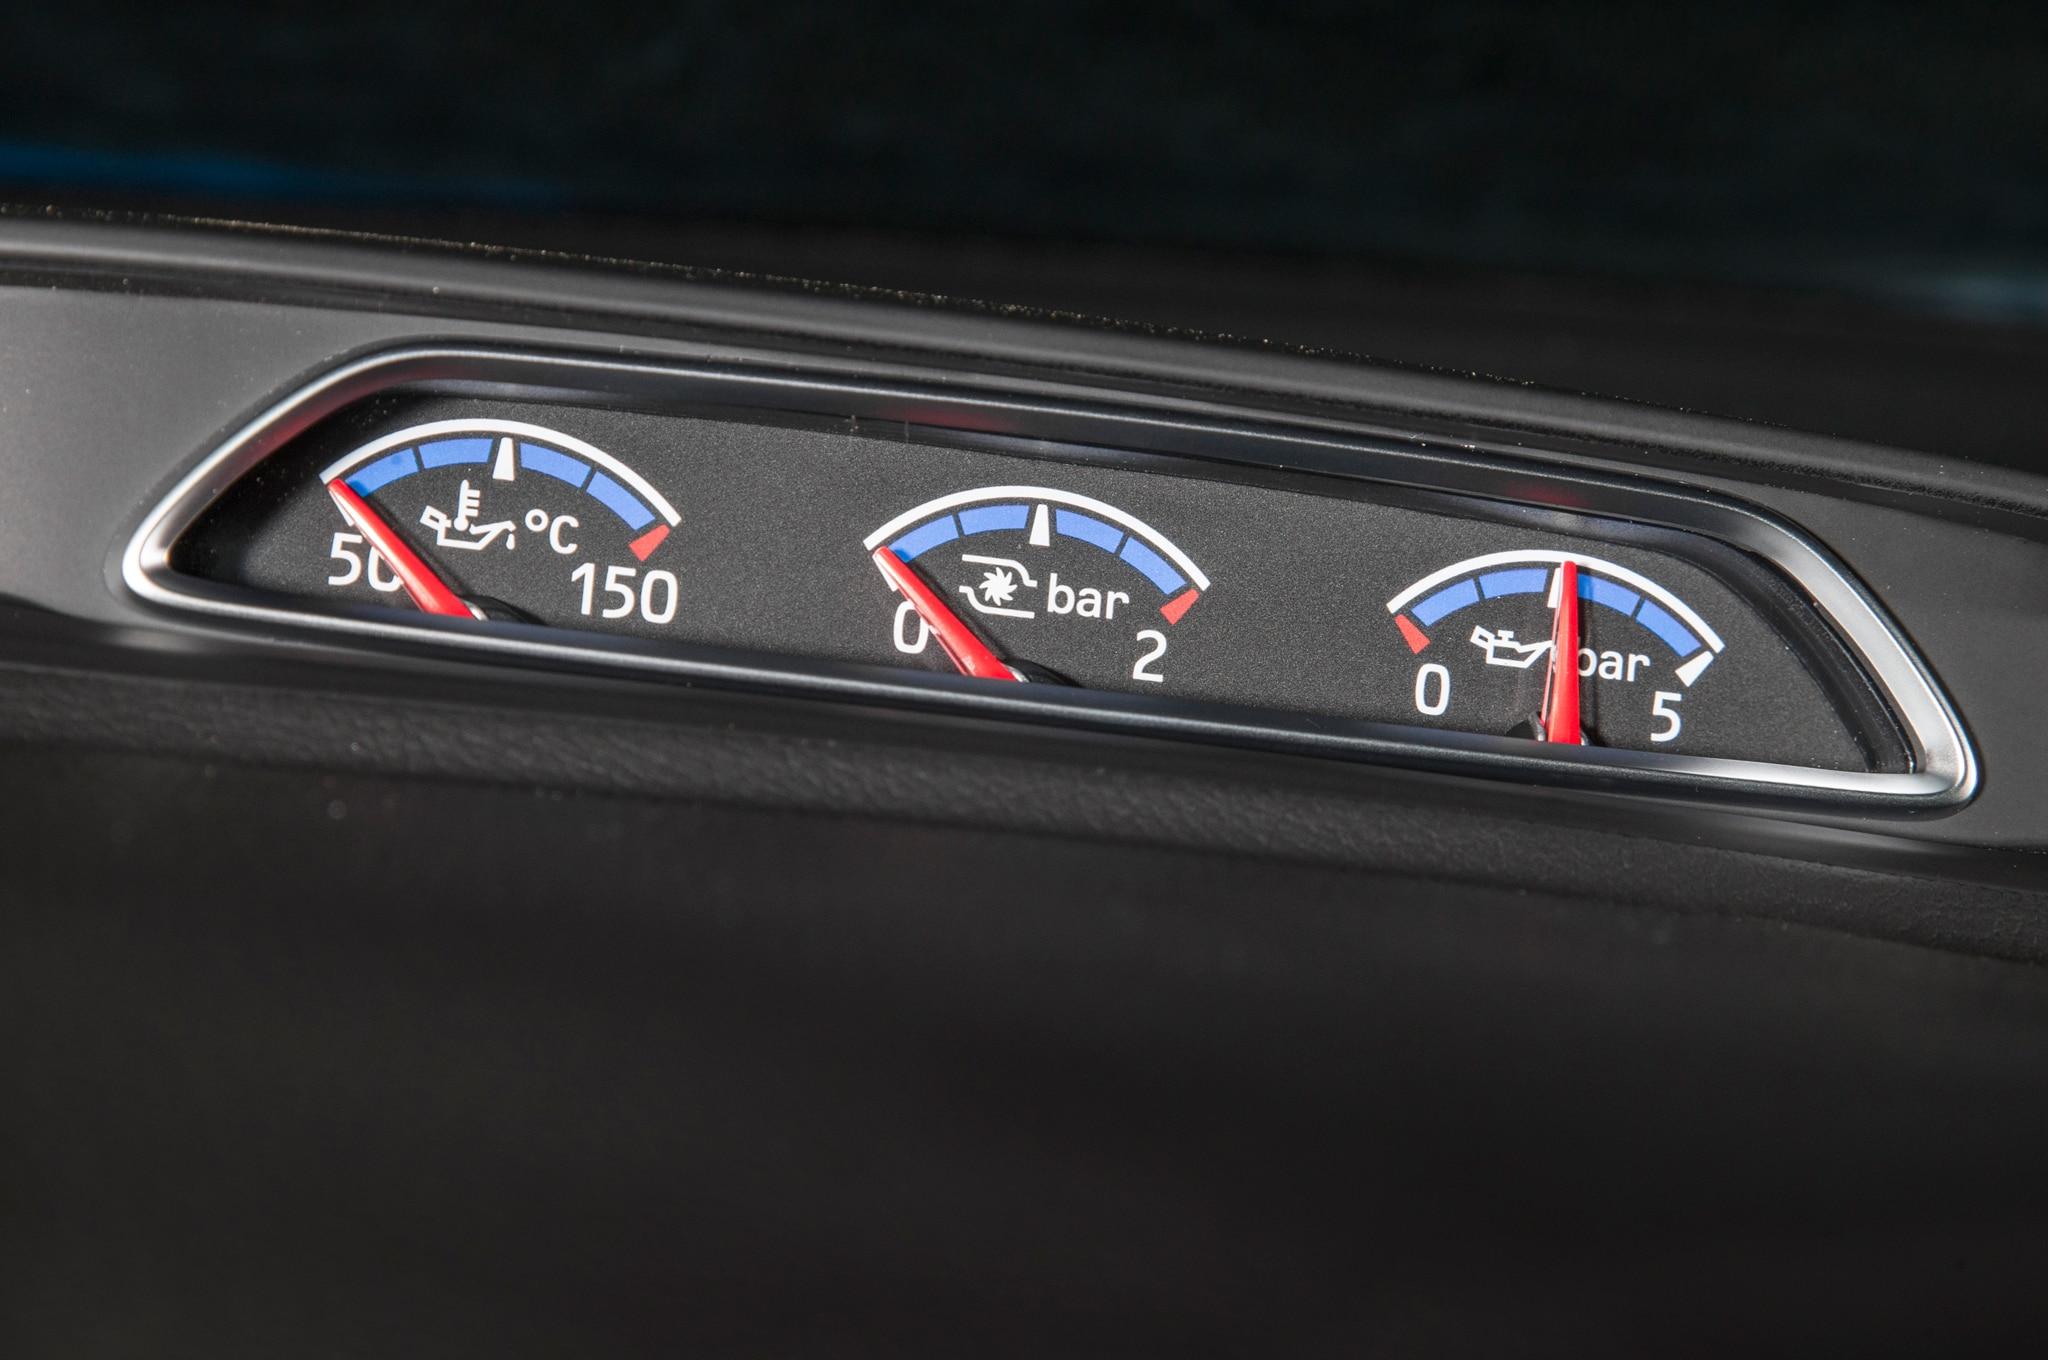 Ford Focus Rs Aumenta Potencia A 370 Hp